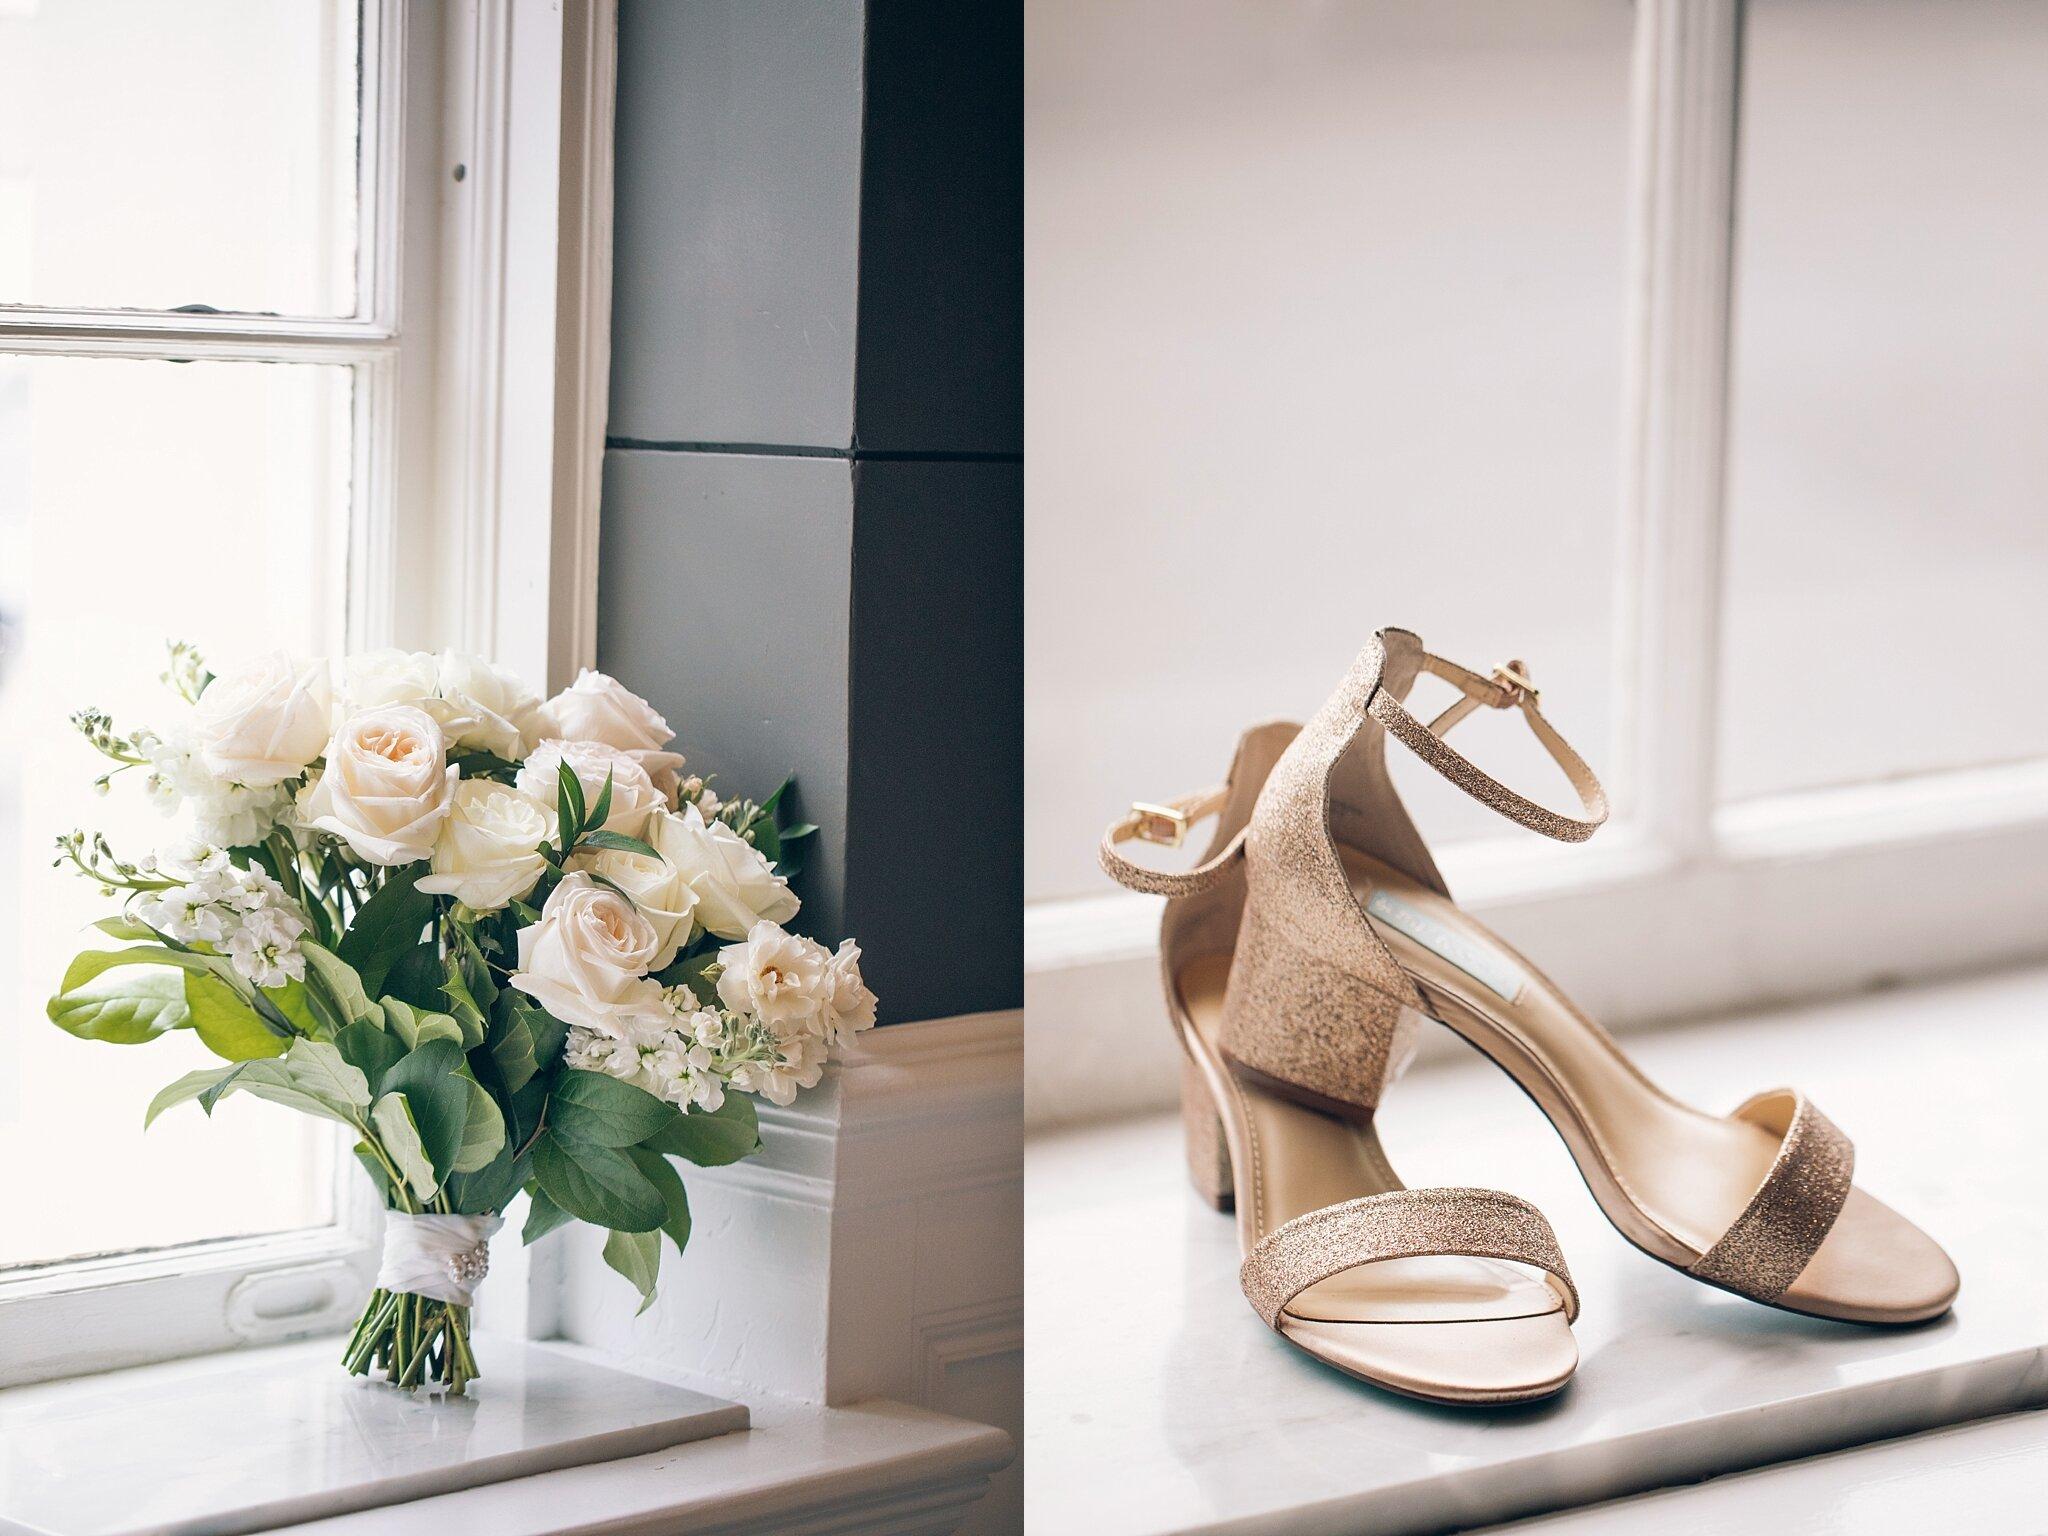 patrick-henry-ballroom-wedding-roanoke_0465.jpg